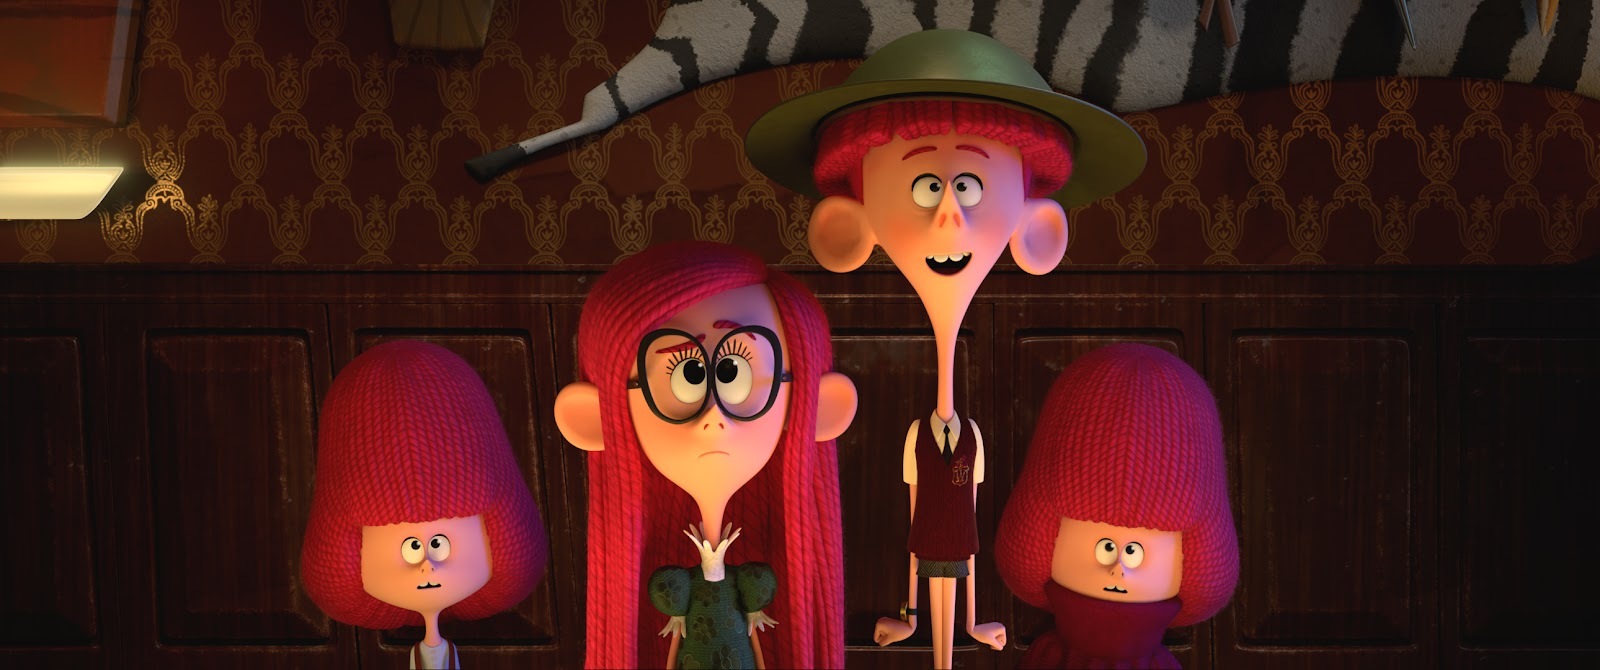 Netflix Animation brings together recent grads for virtual speaker series - Image 2